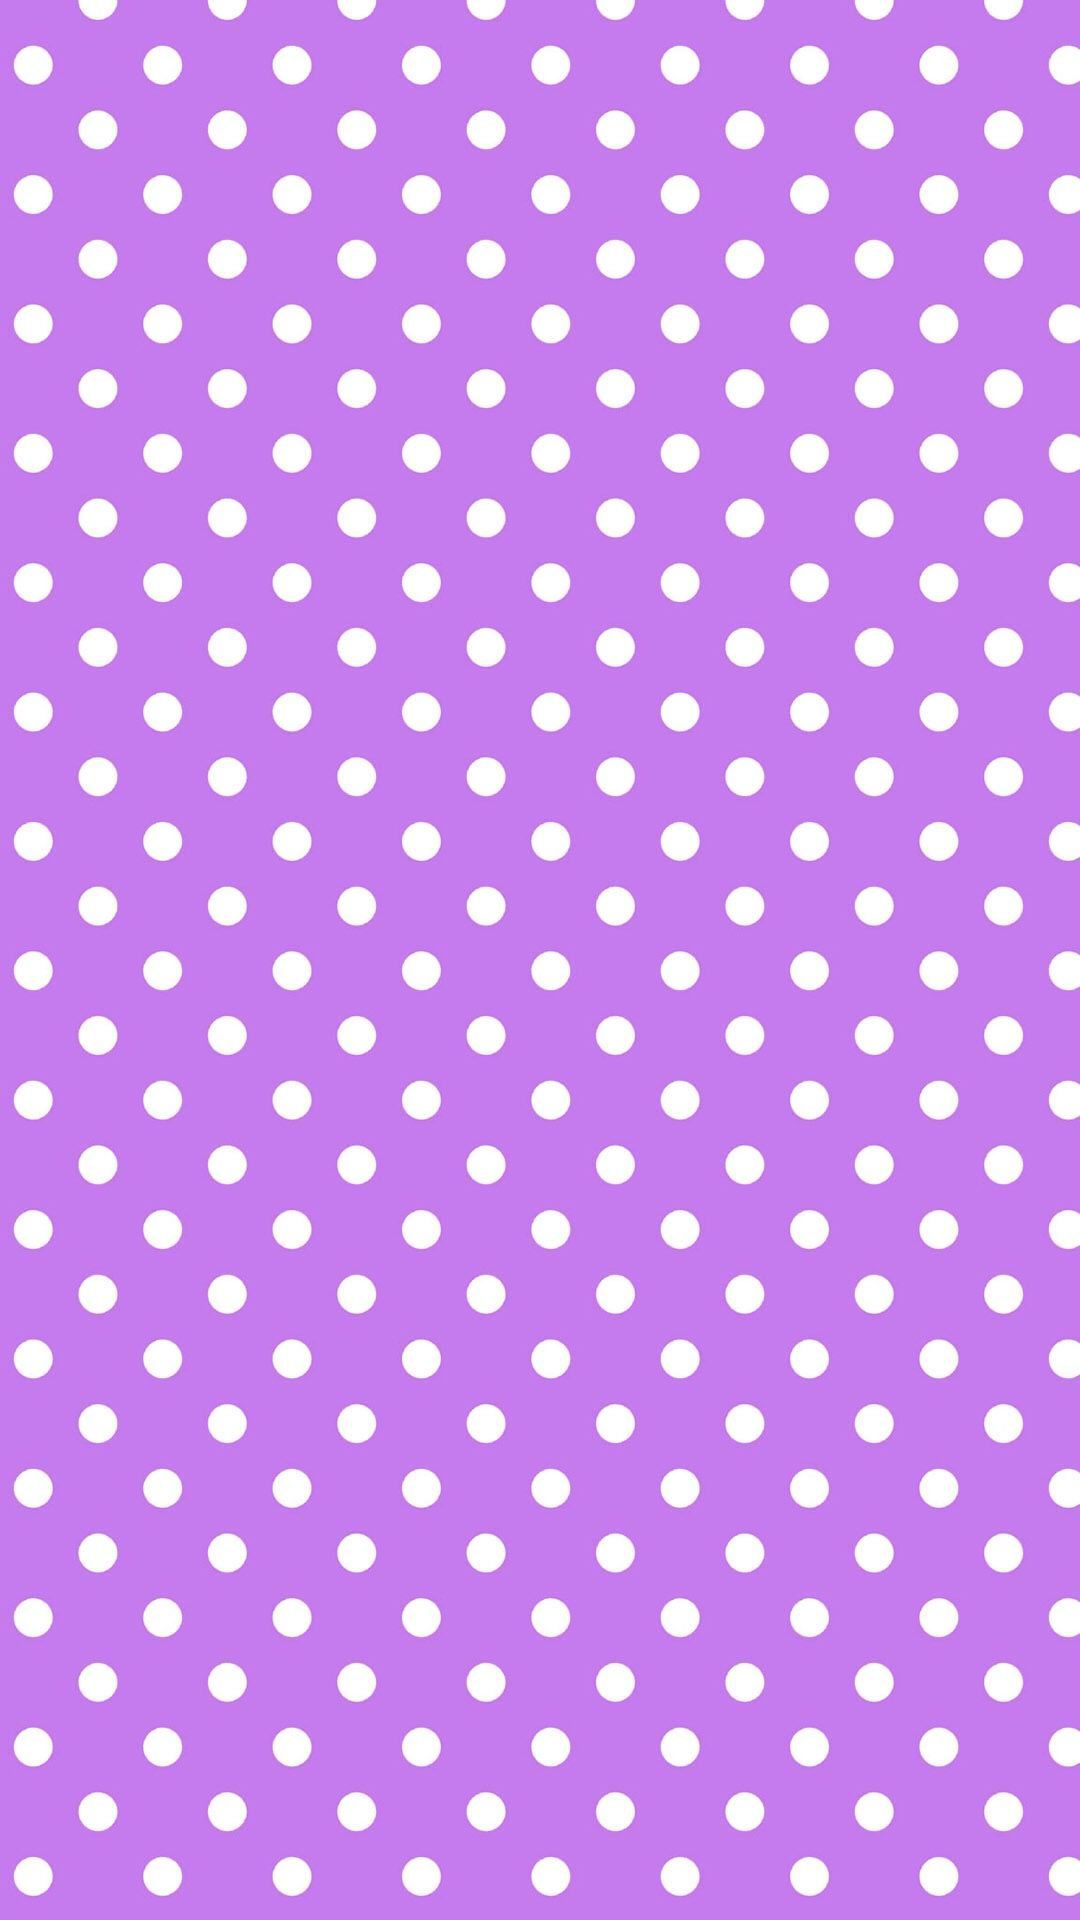 Pin by HoneyBeeXoxo on Stripes/Polka Dots | Purple ...